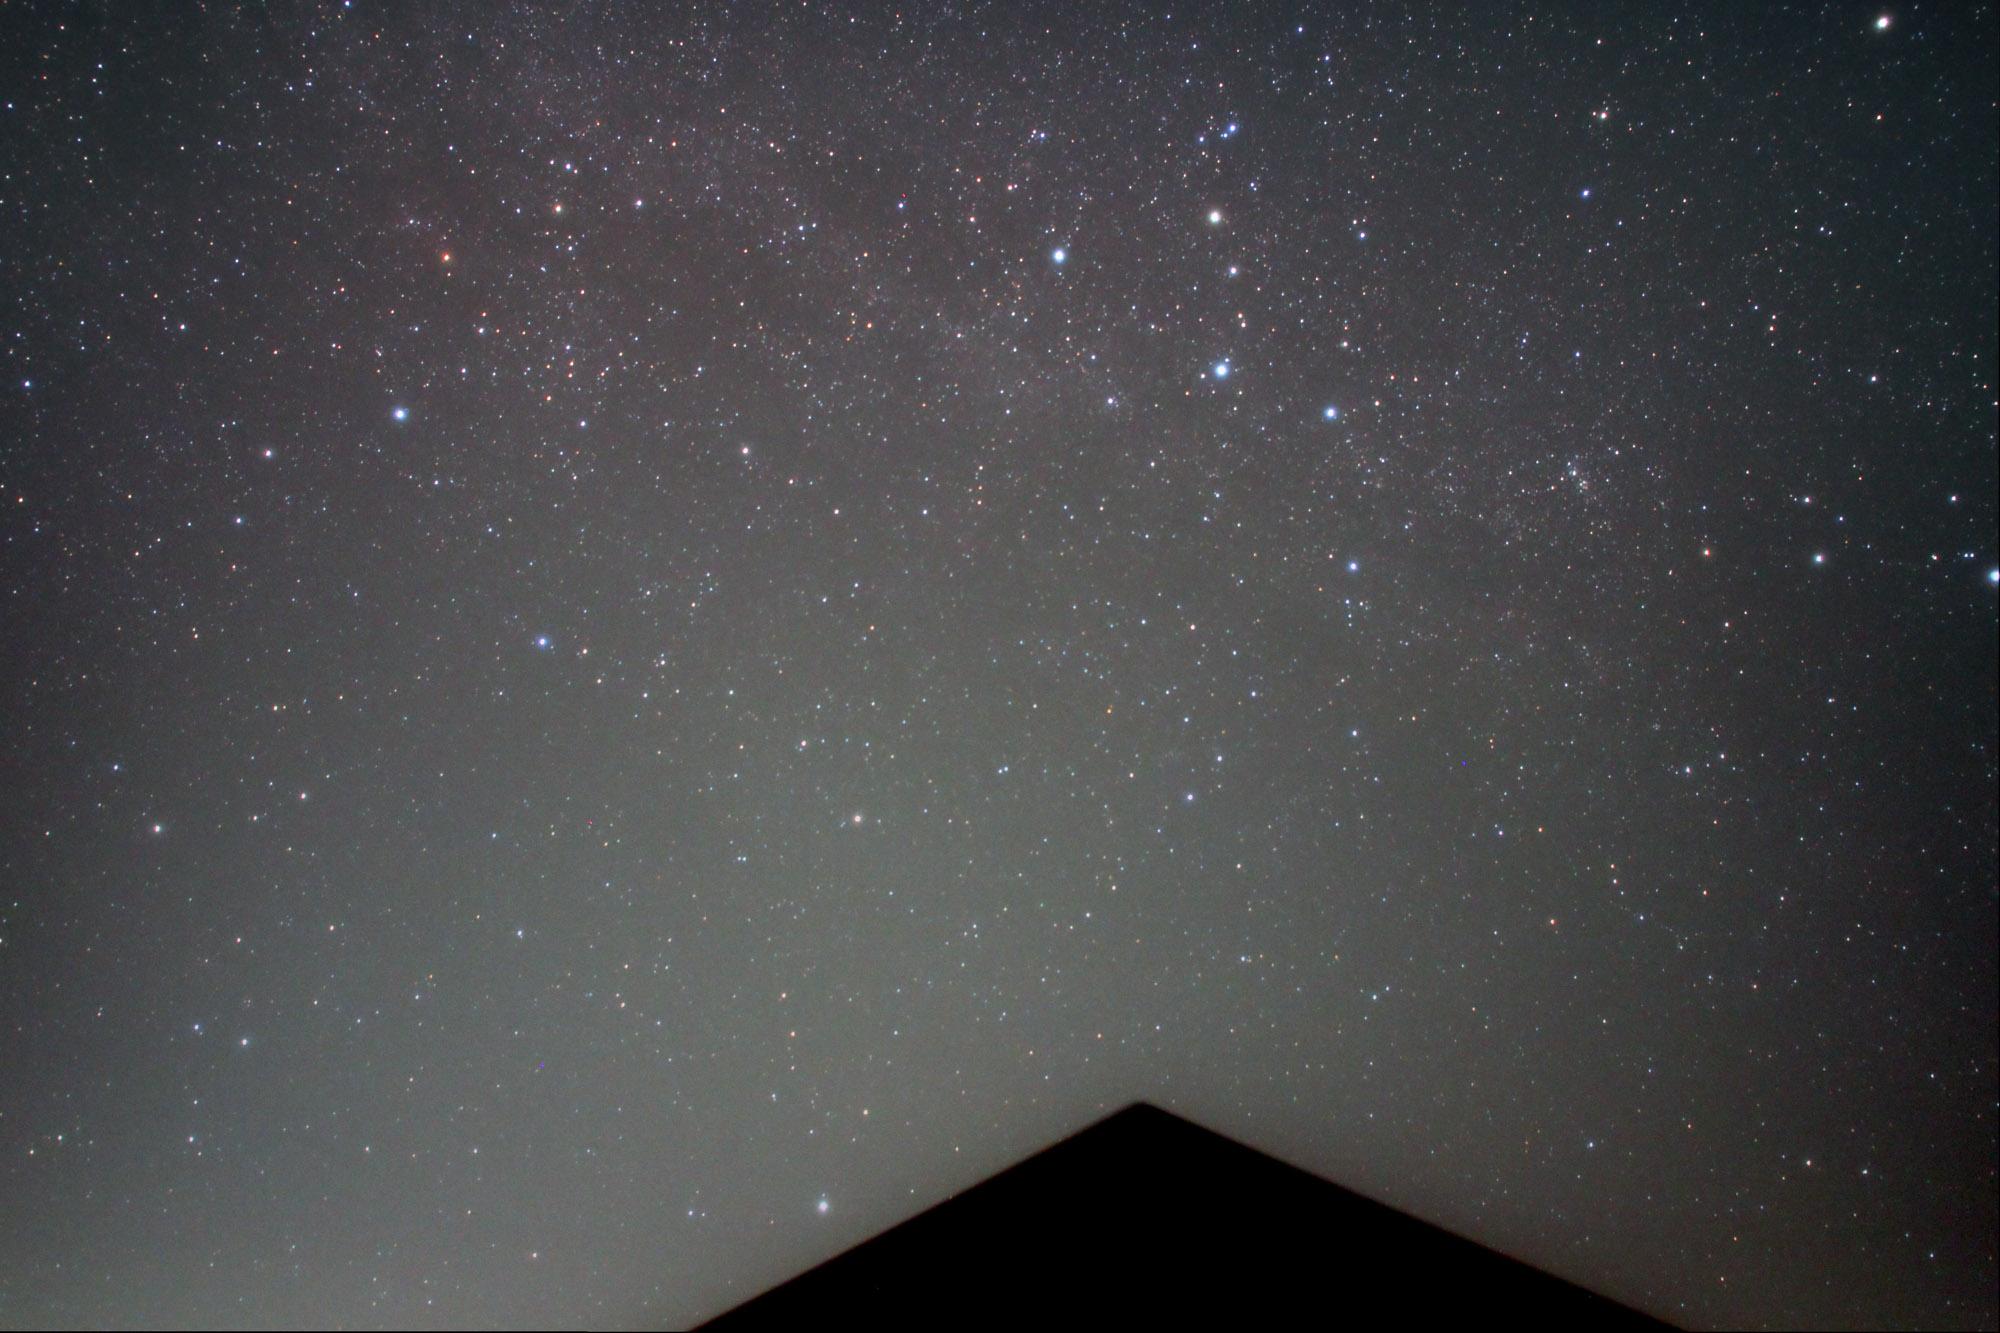 8月14日の星野写真_e0174091_1733894.jpg